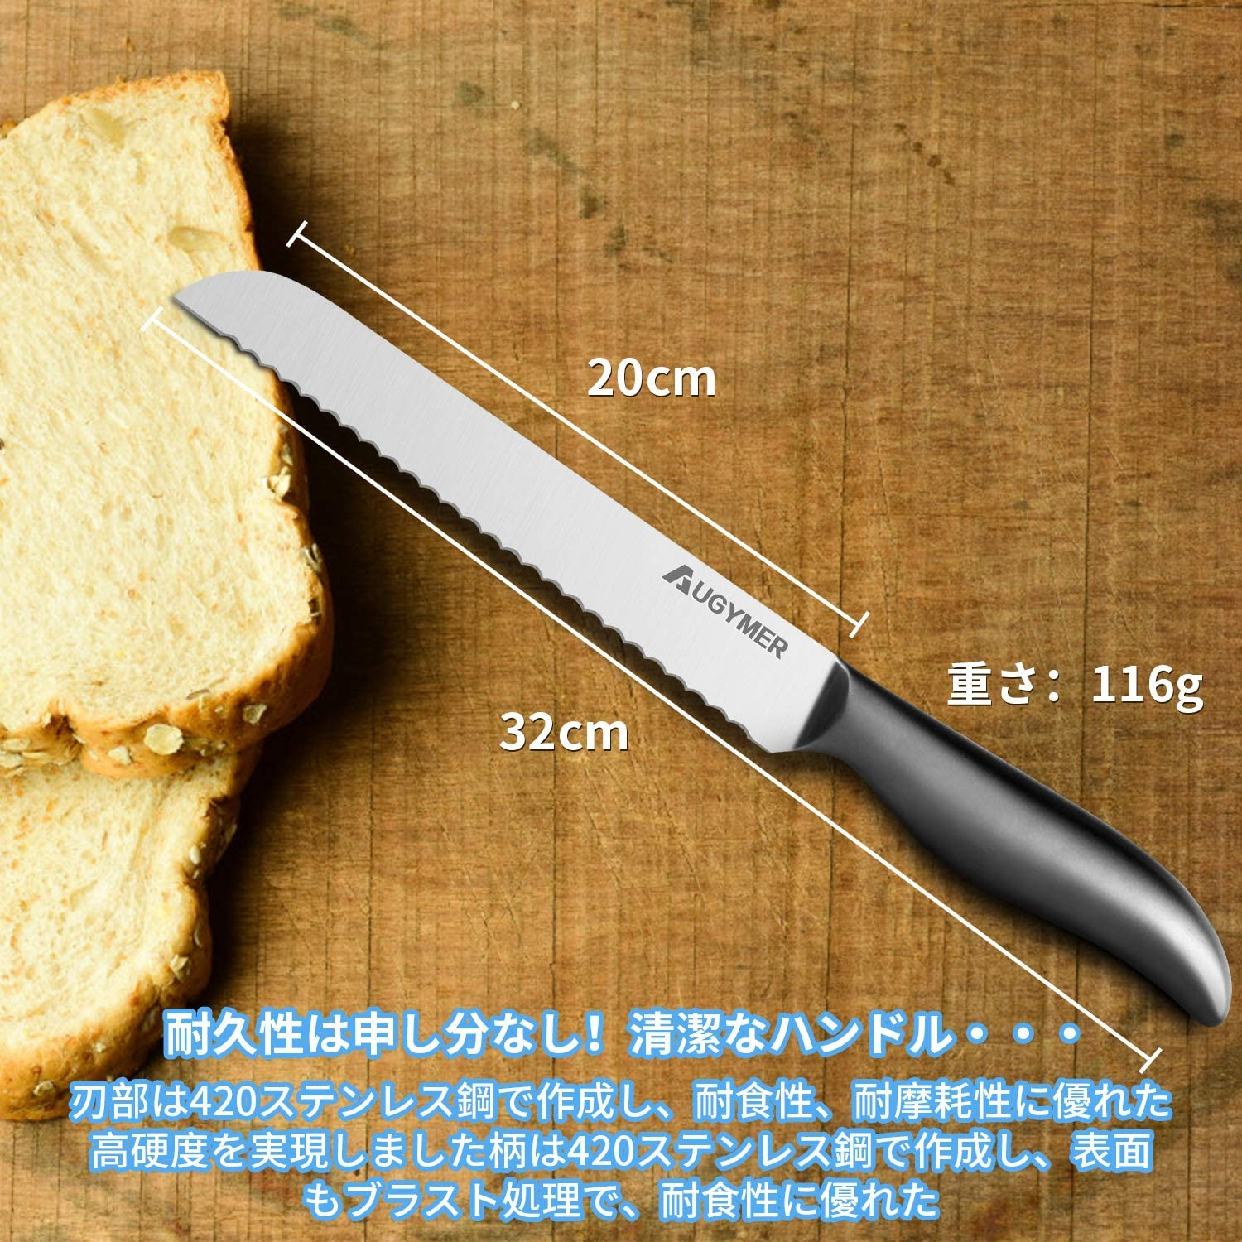 AUGYMER(おうじまー)パン切り包丁 (全長/約32cm) シルバーの商品画像3